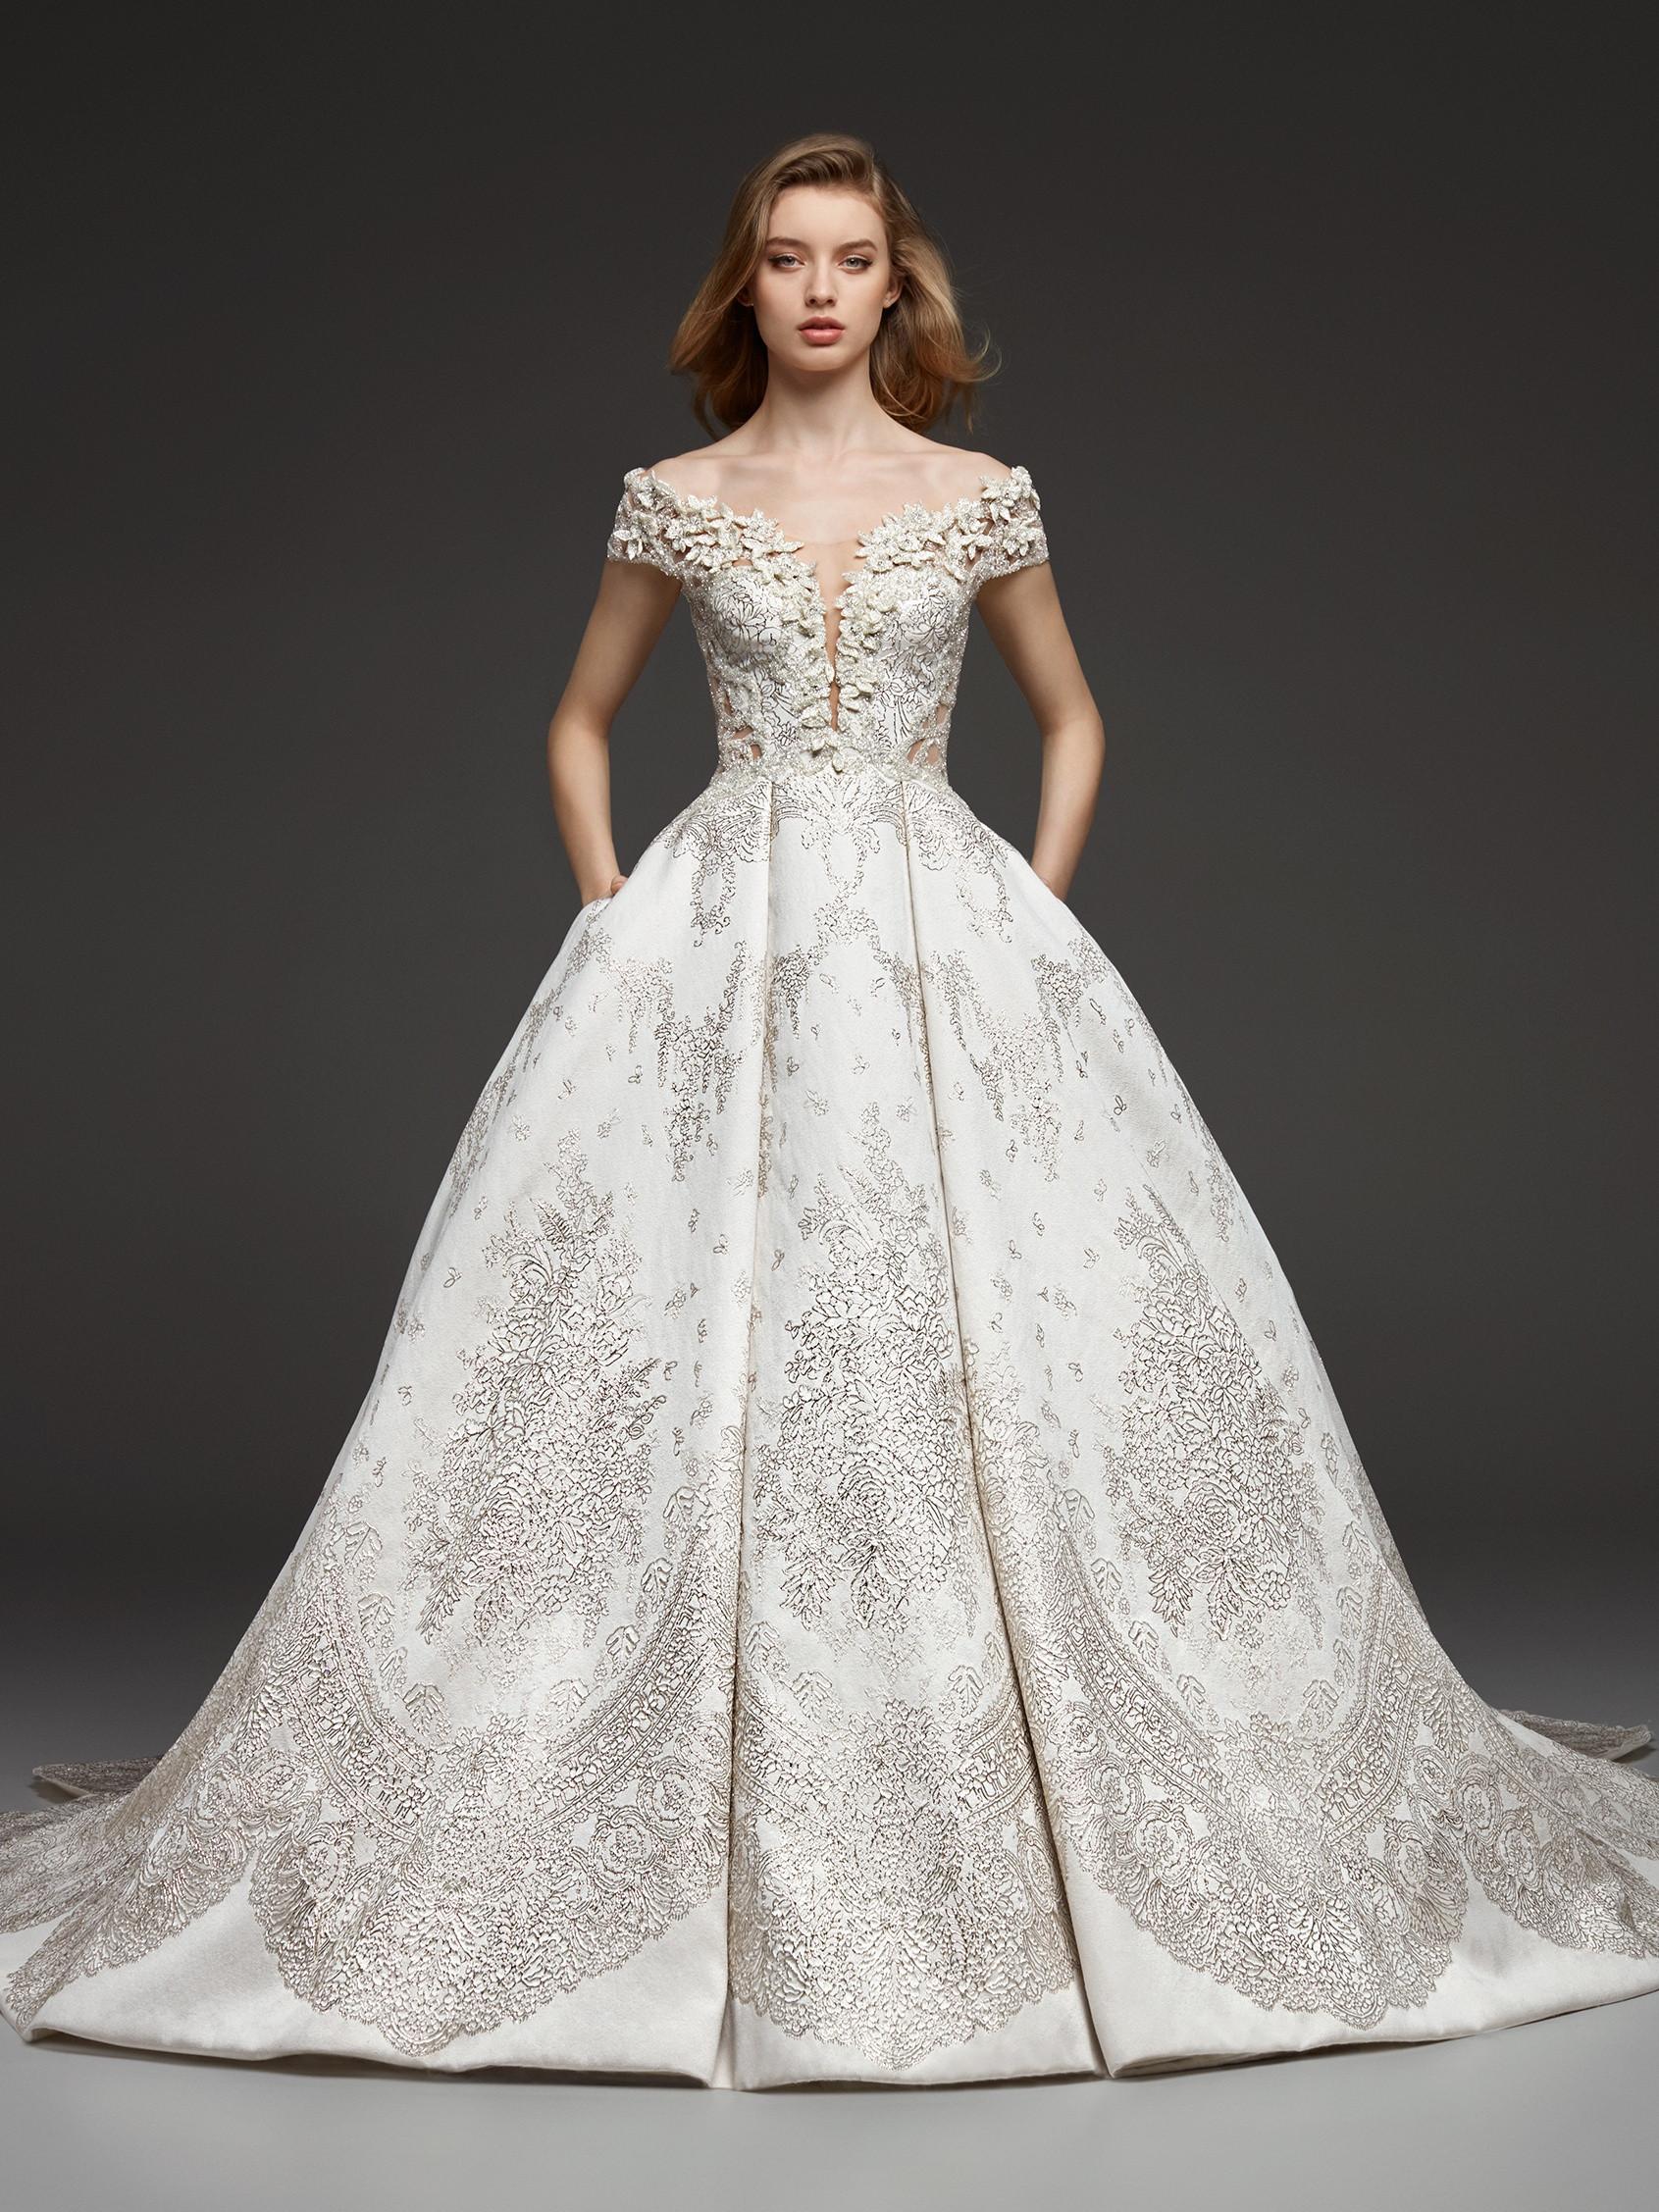 76e197dad3 tipos-de-blanco-para-vestidos-de-novia-02